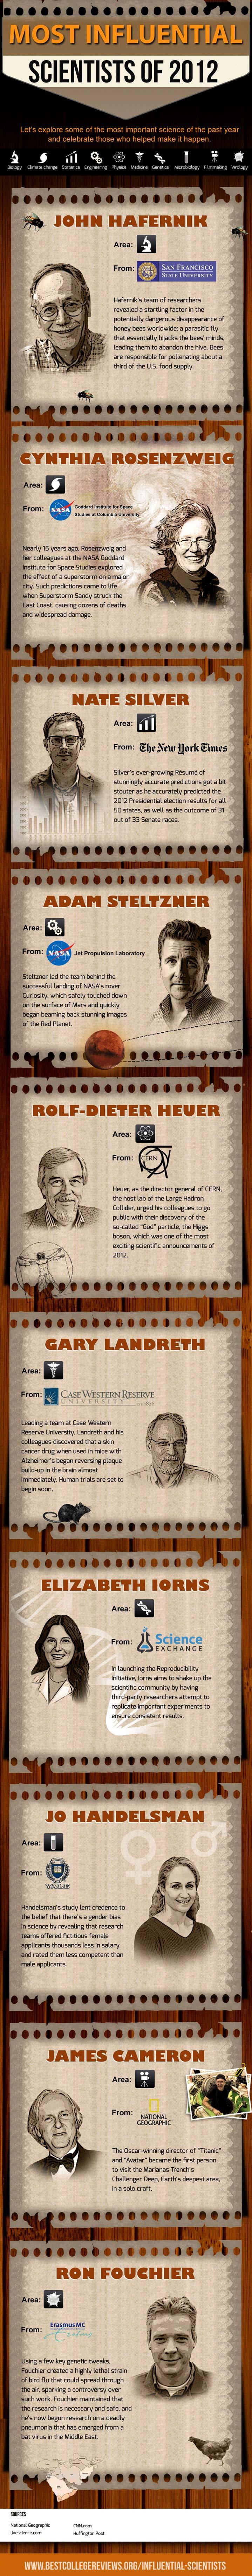 Scientific Achievements 2012-Infographic